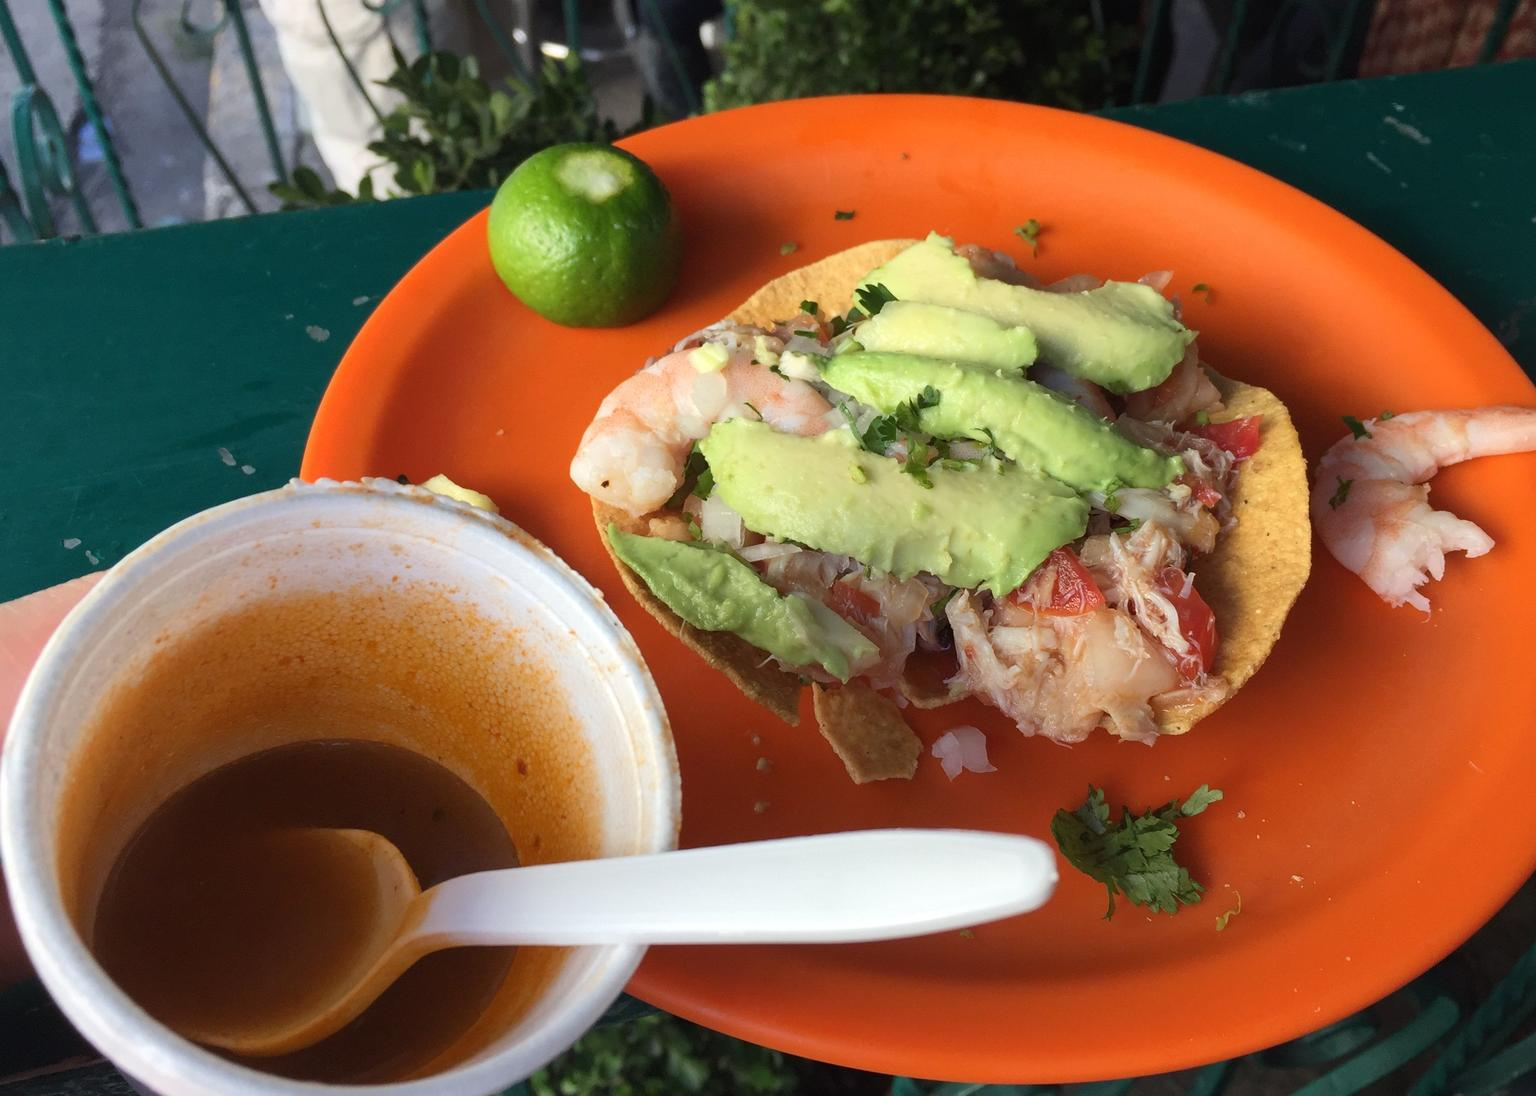 MORE PHOTOS, Historic Center Food Tour in Mexico City